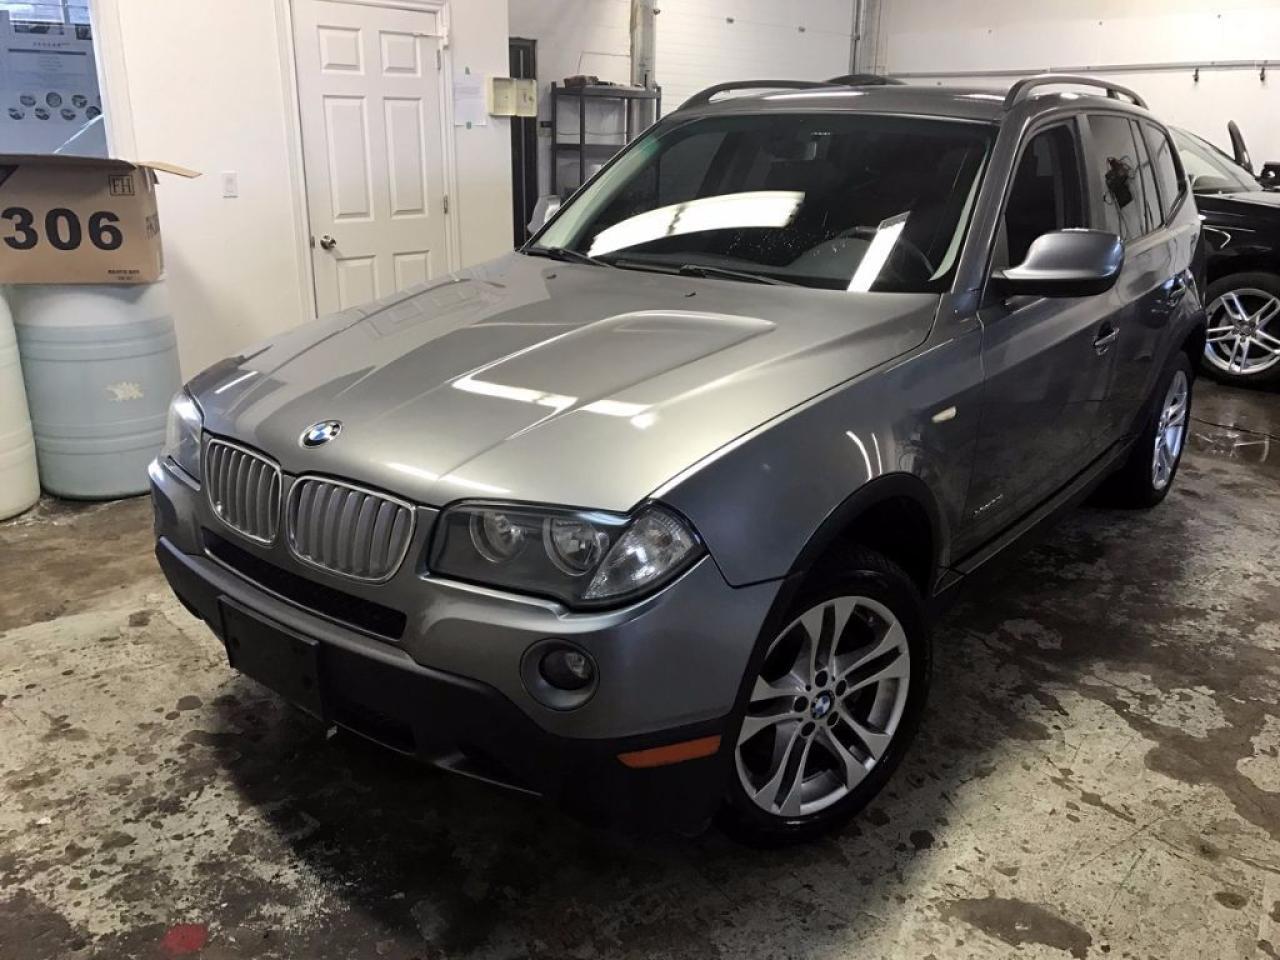 Photo of Gray 2010 BMW X3